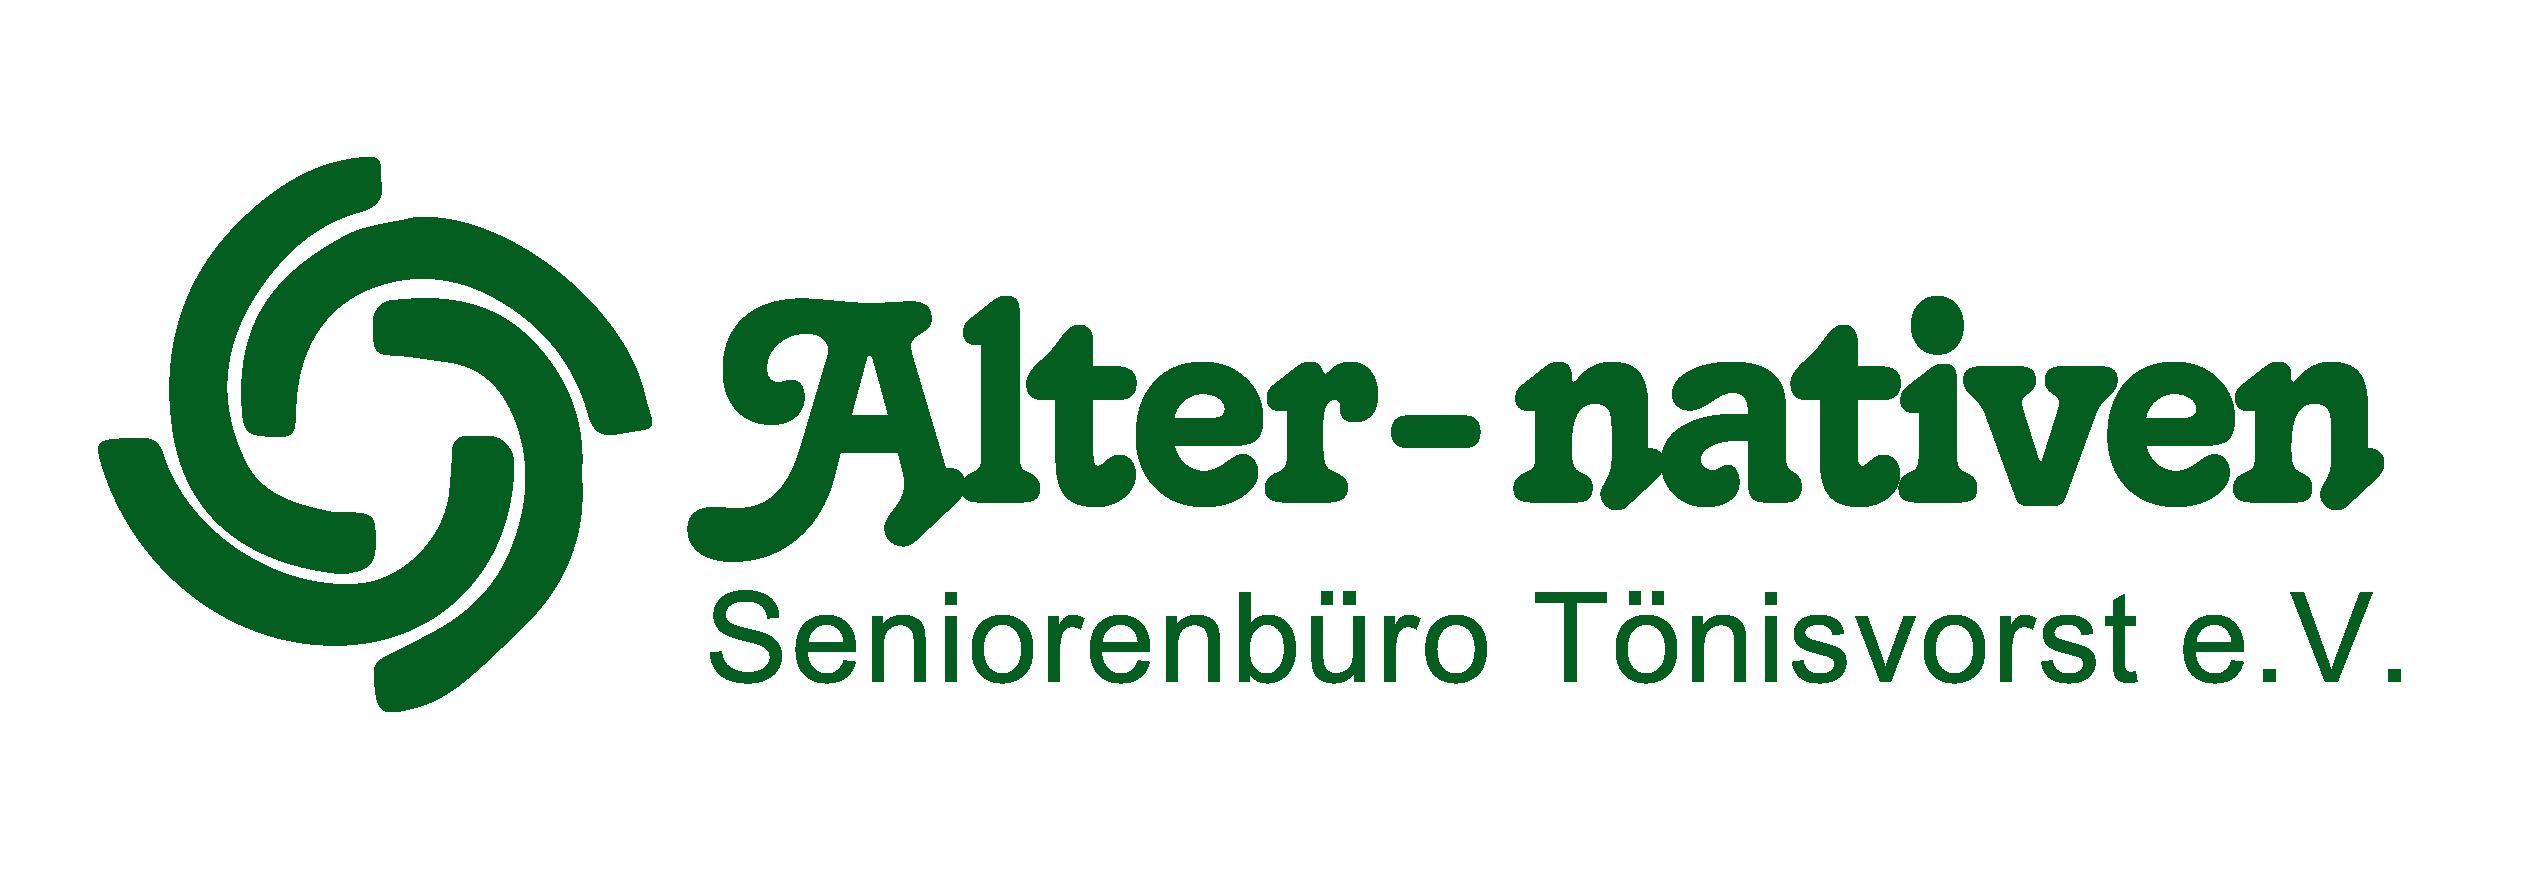 logo_nachbau_gruen